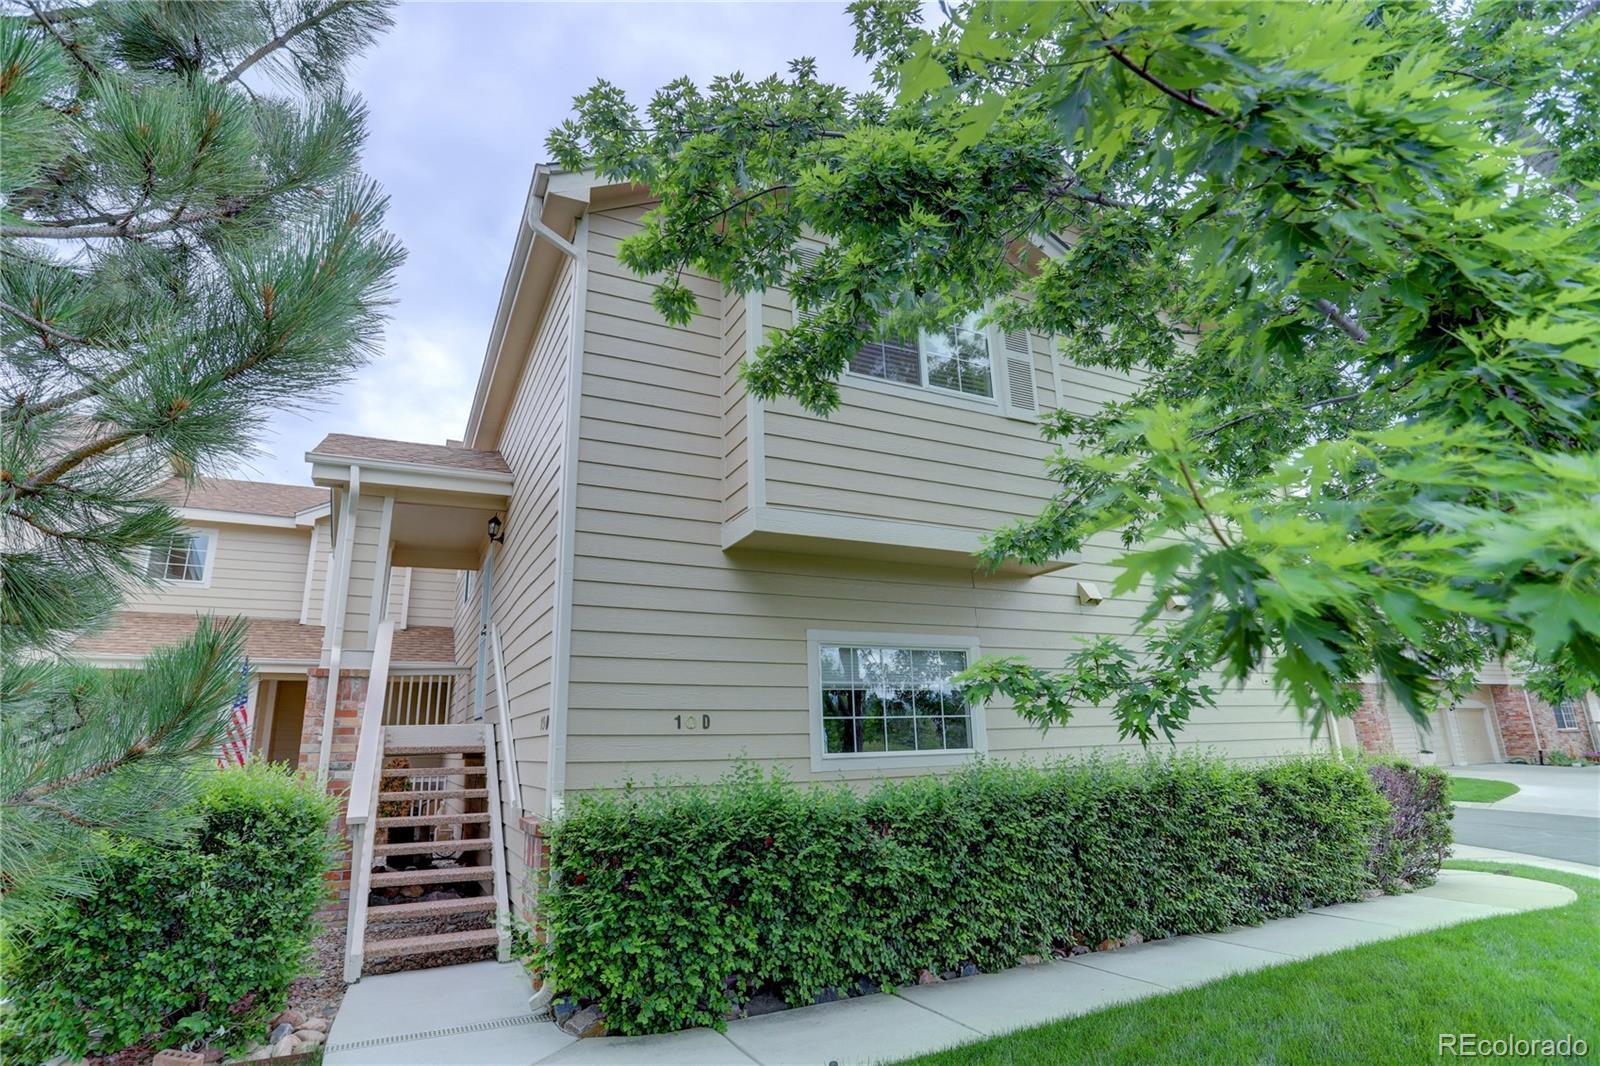 MLS# 2836182 - 2 - 7700 W Grant Ranch Boulevard #10D, Littleton, CO 80123